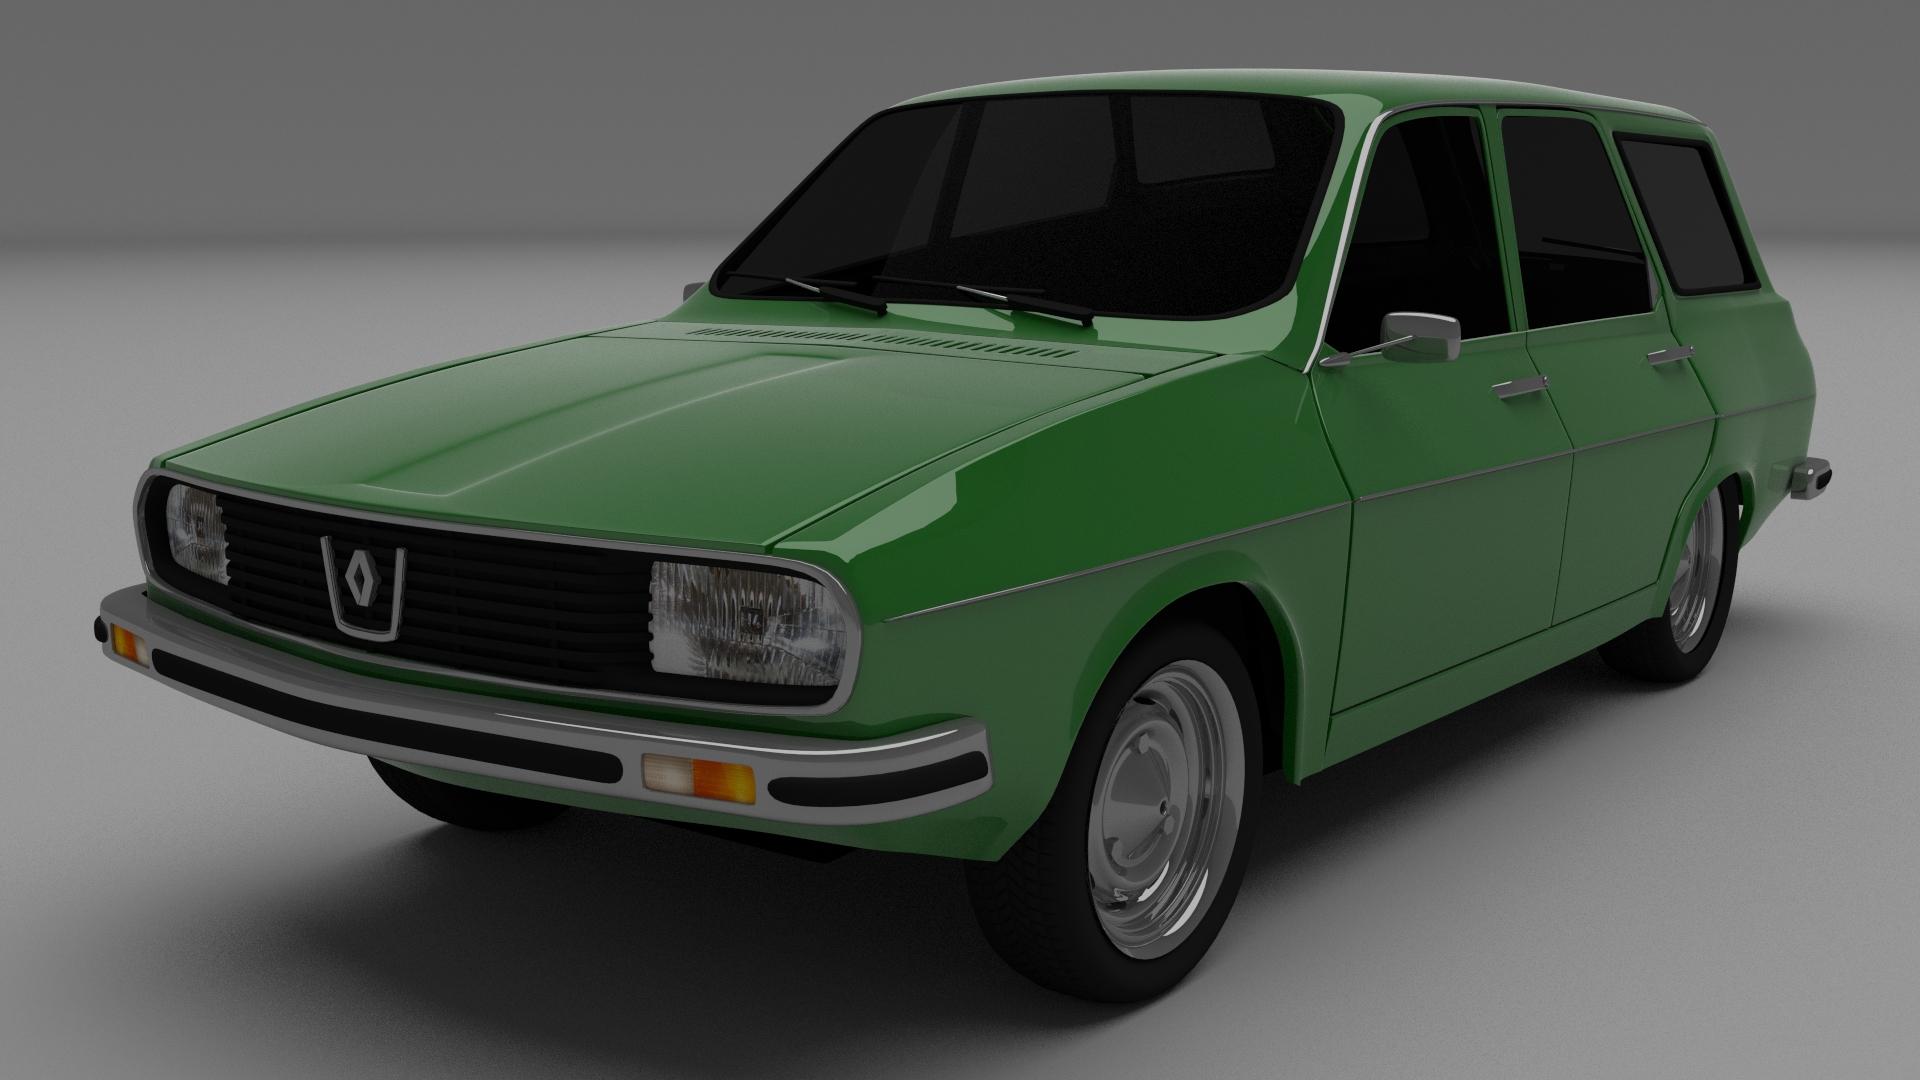 Renault 12 Dacia 1300 Estate 3d Model Obj Blend Dae